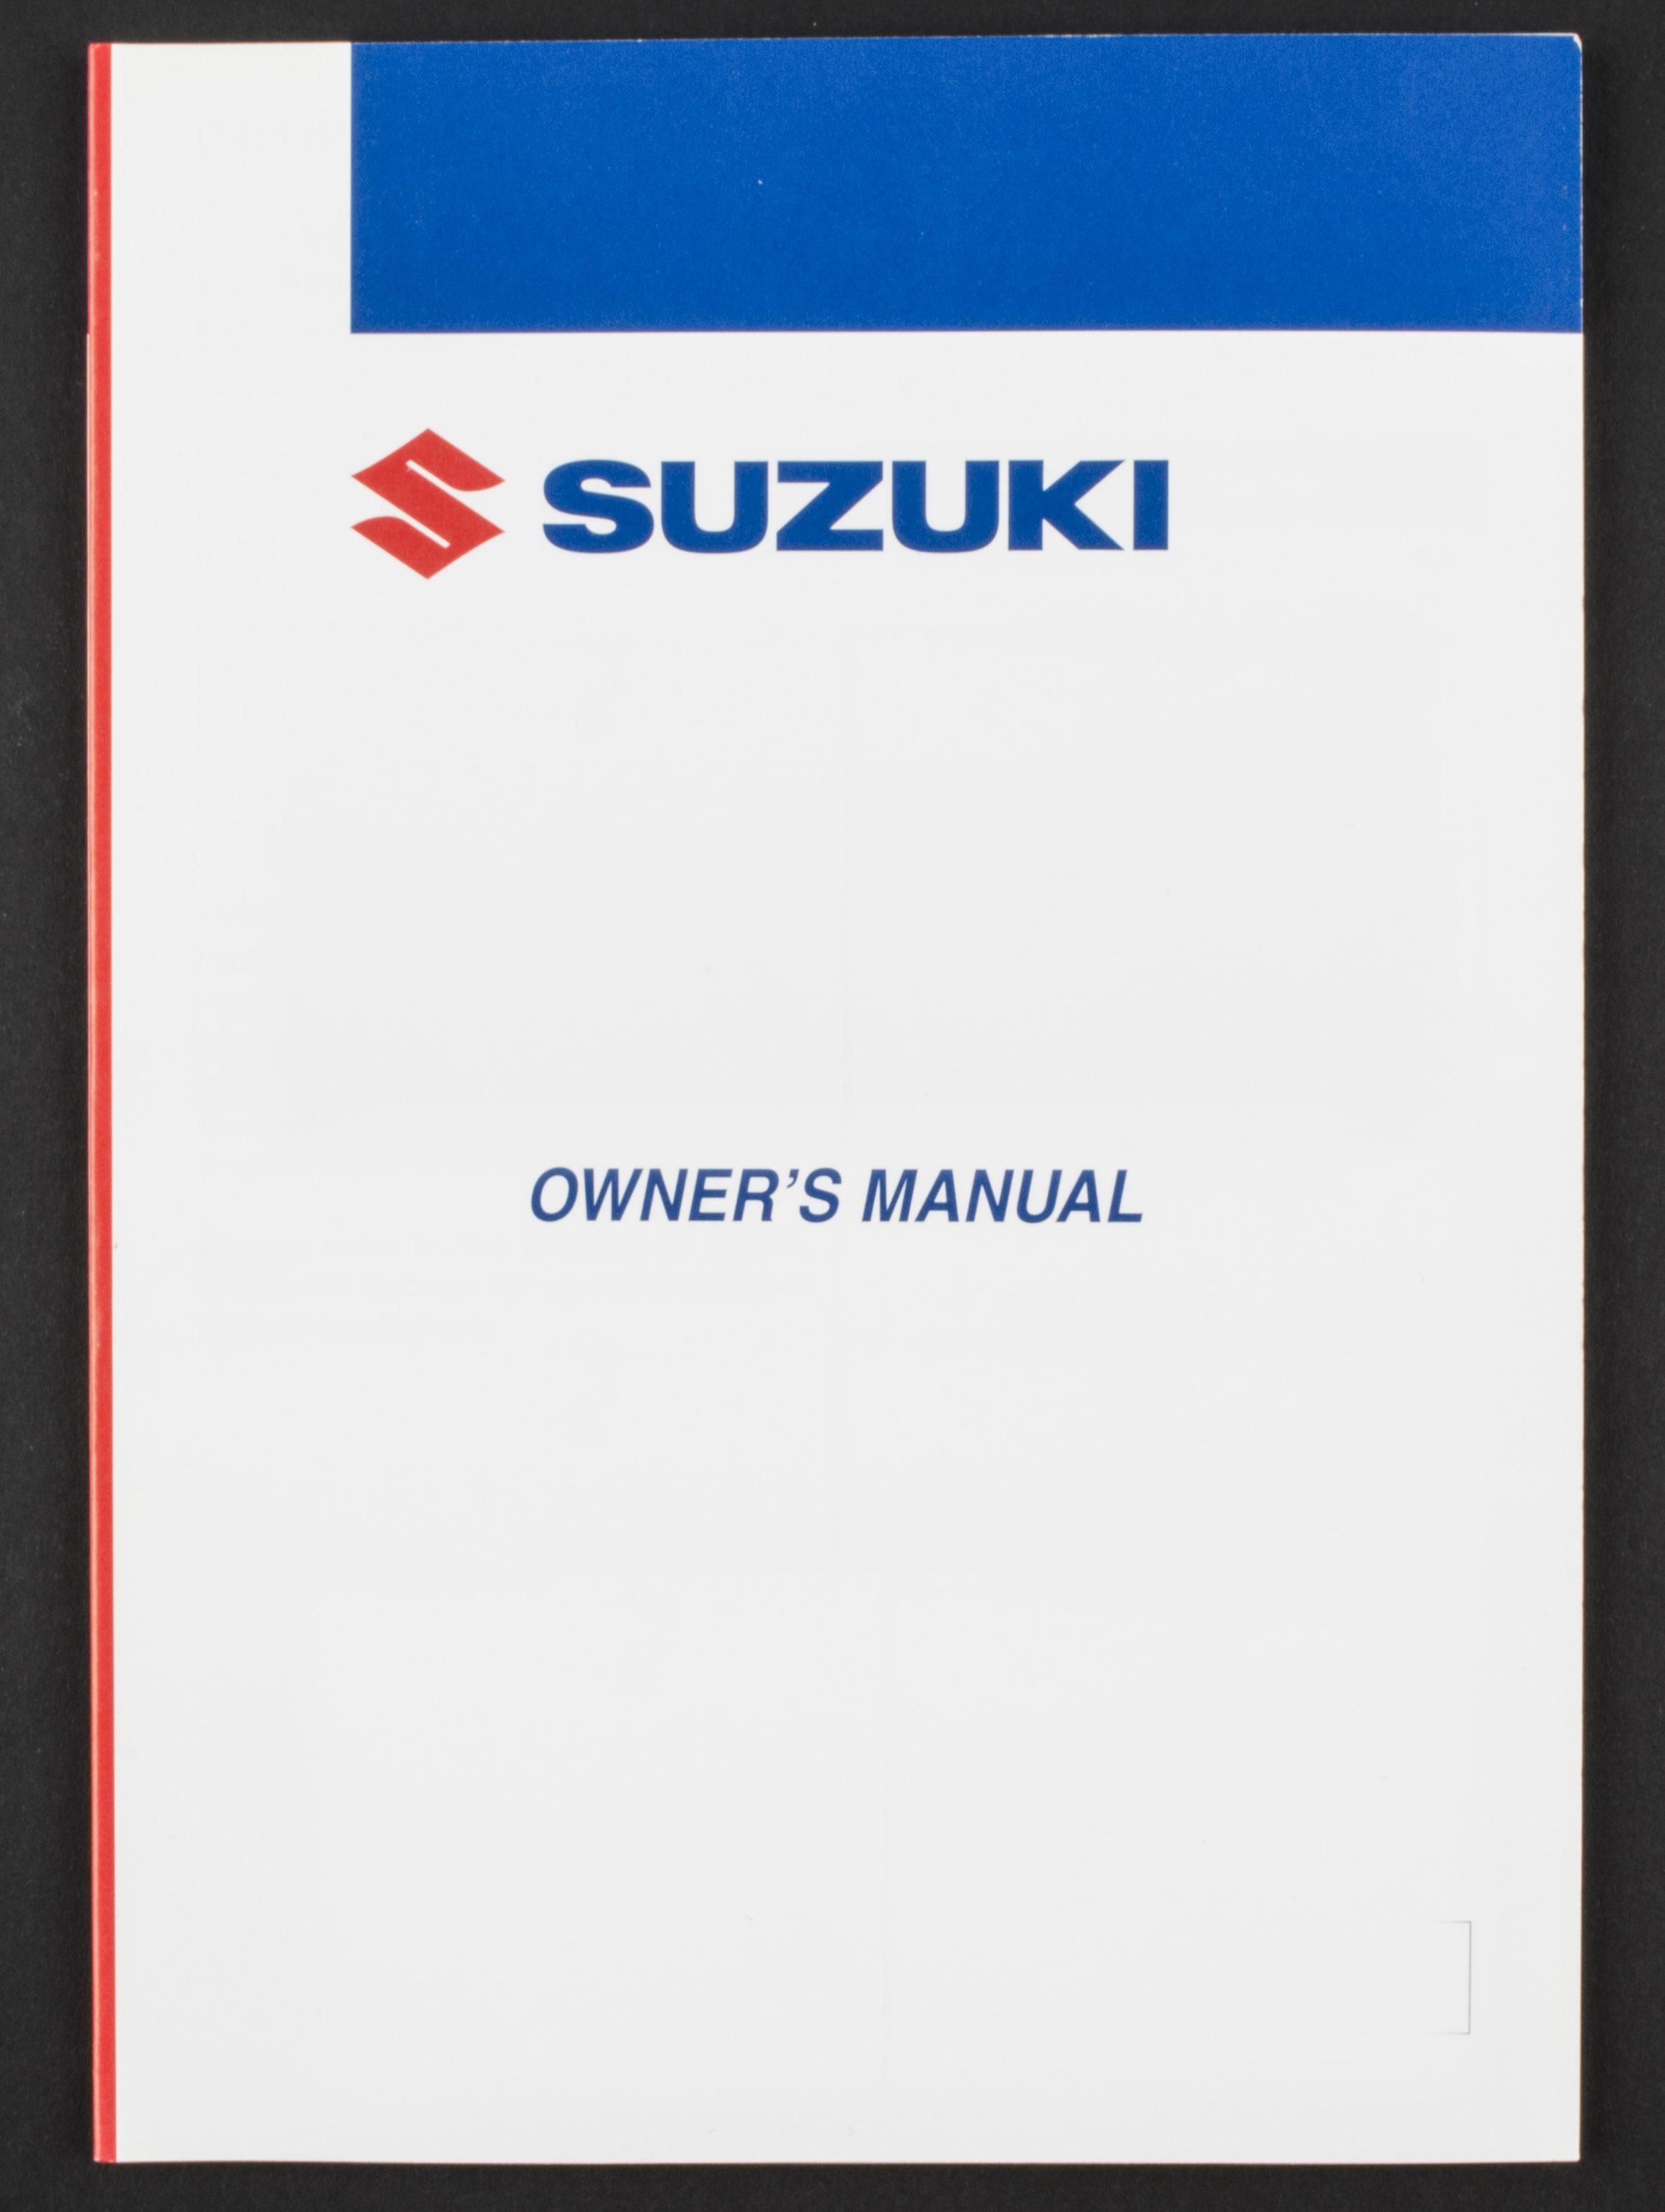 Sentinel Genuine Suzuki ATV Owners Manual For LT-Z250 (2008) 99011-21G55-